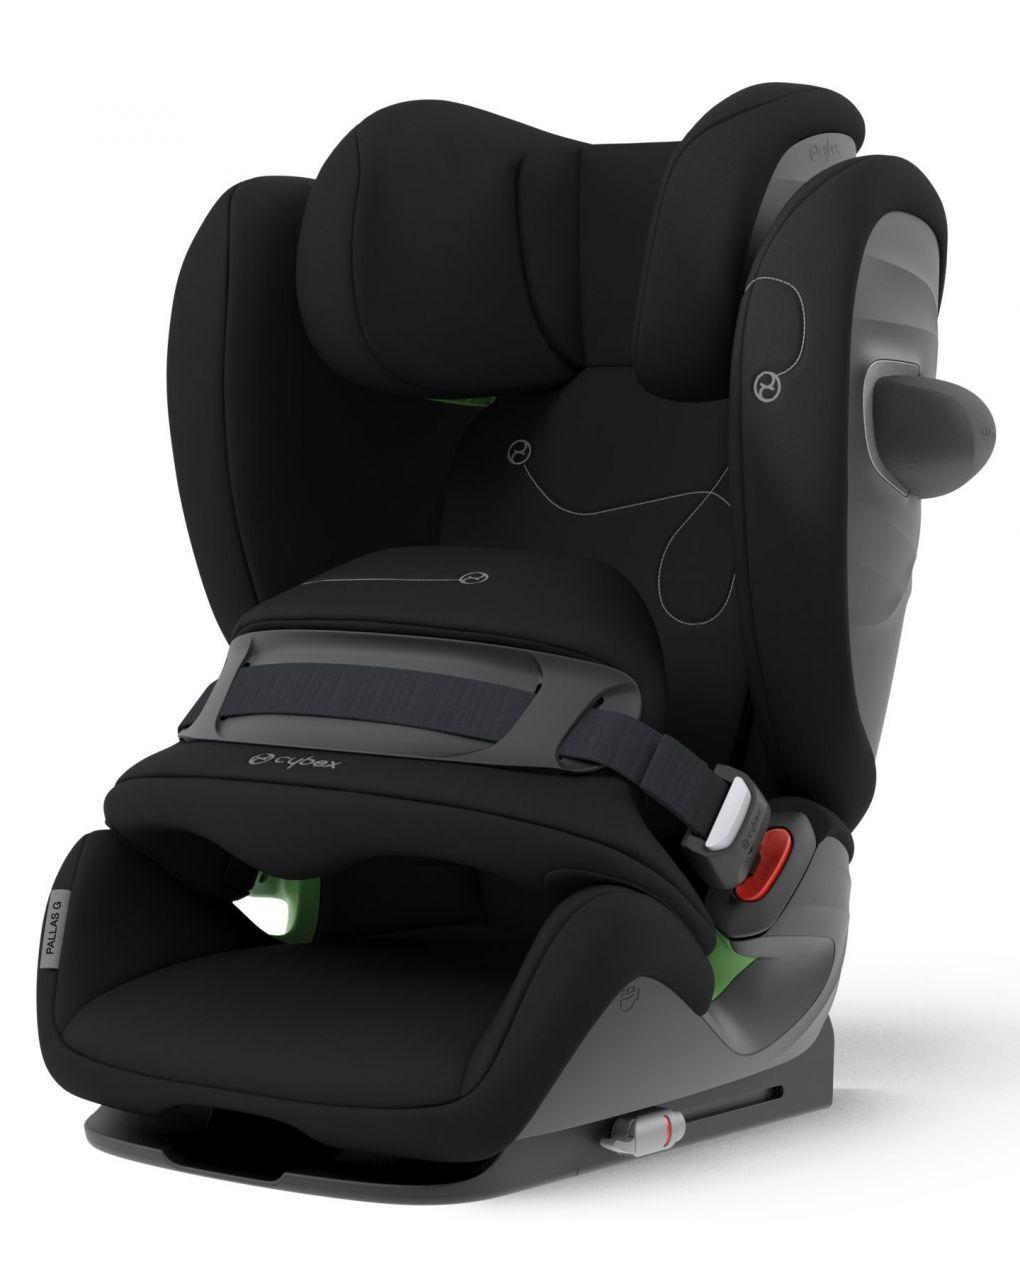 Cybex Κάθισμα Αυτοκινήτου Pallas G I-Size - Μαύρο